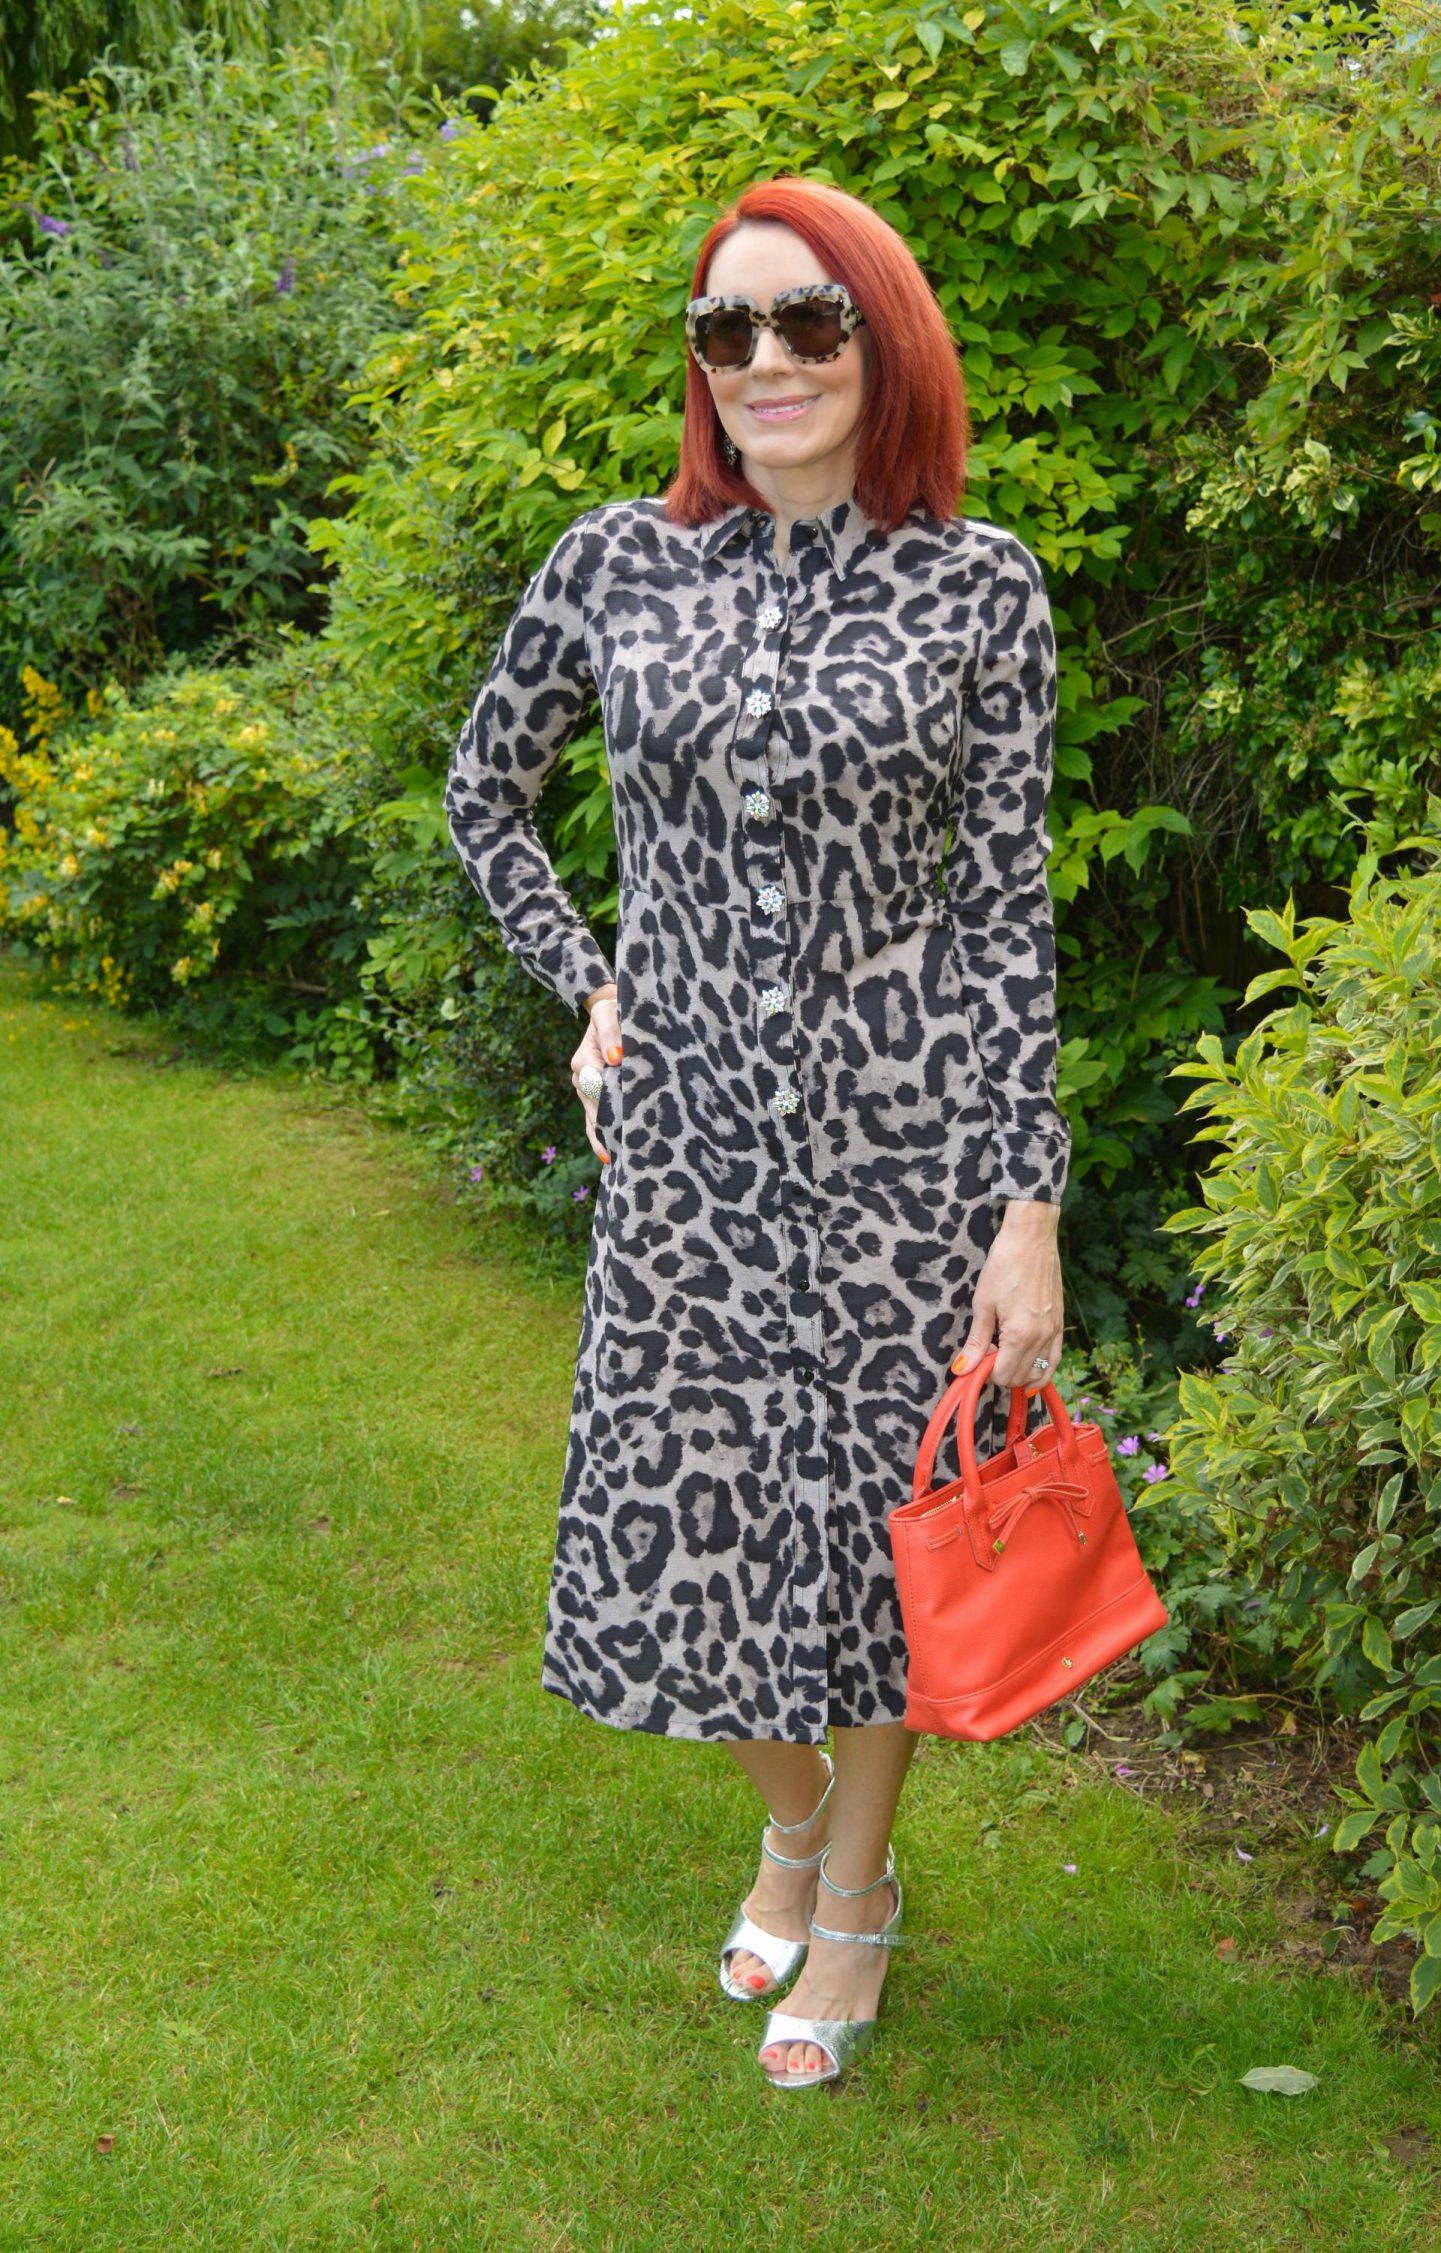 Blinged Up Leopard Print, Mela London leopard print shirt dress, Goodnight Irene button covers, Escada square marble sunglasses, Laura Ashley orange bag, Papaya silver strappy sandals